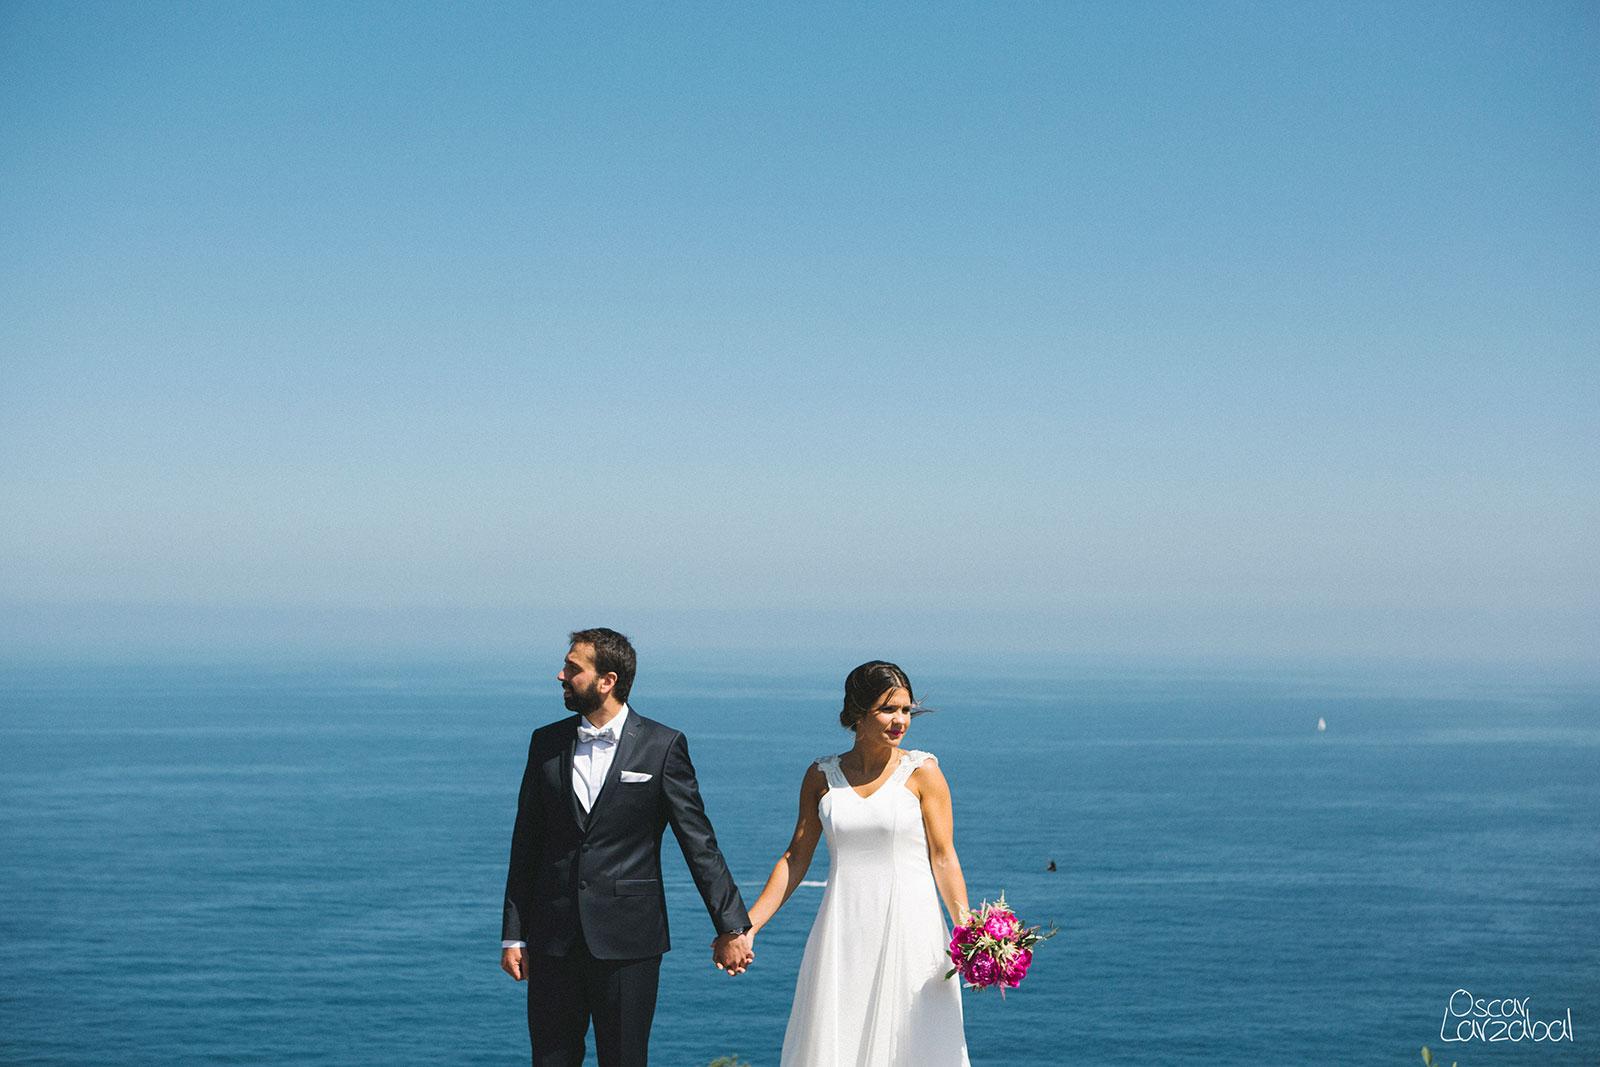 Fotografo bodas en Cantabria Santander